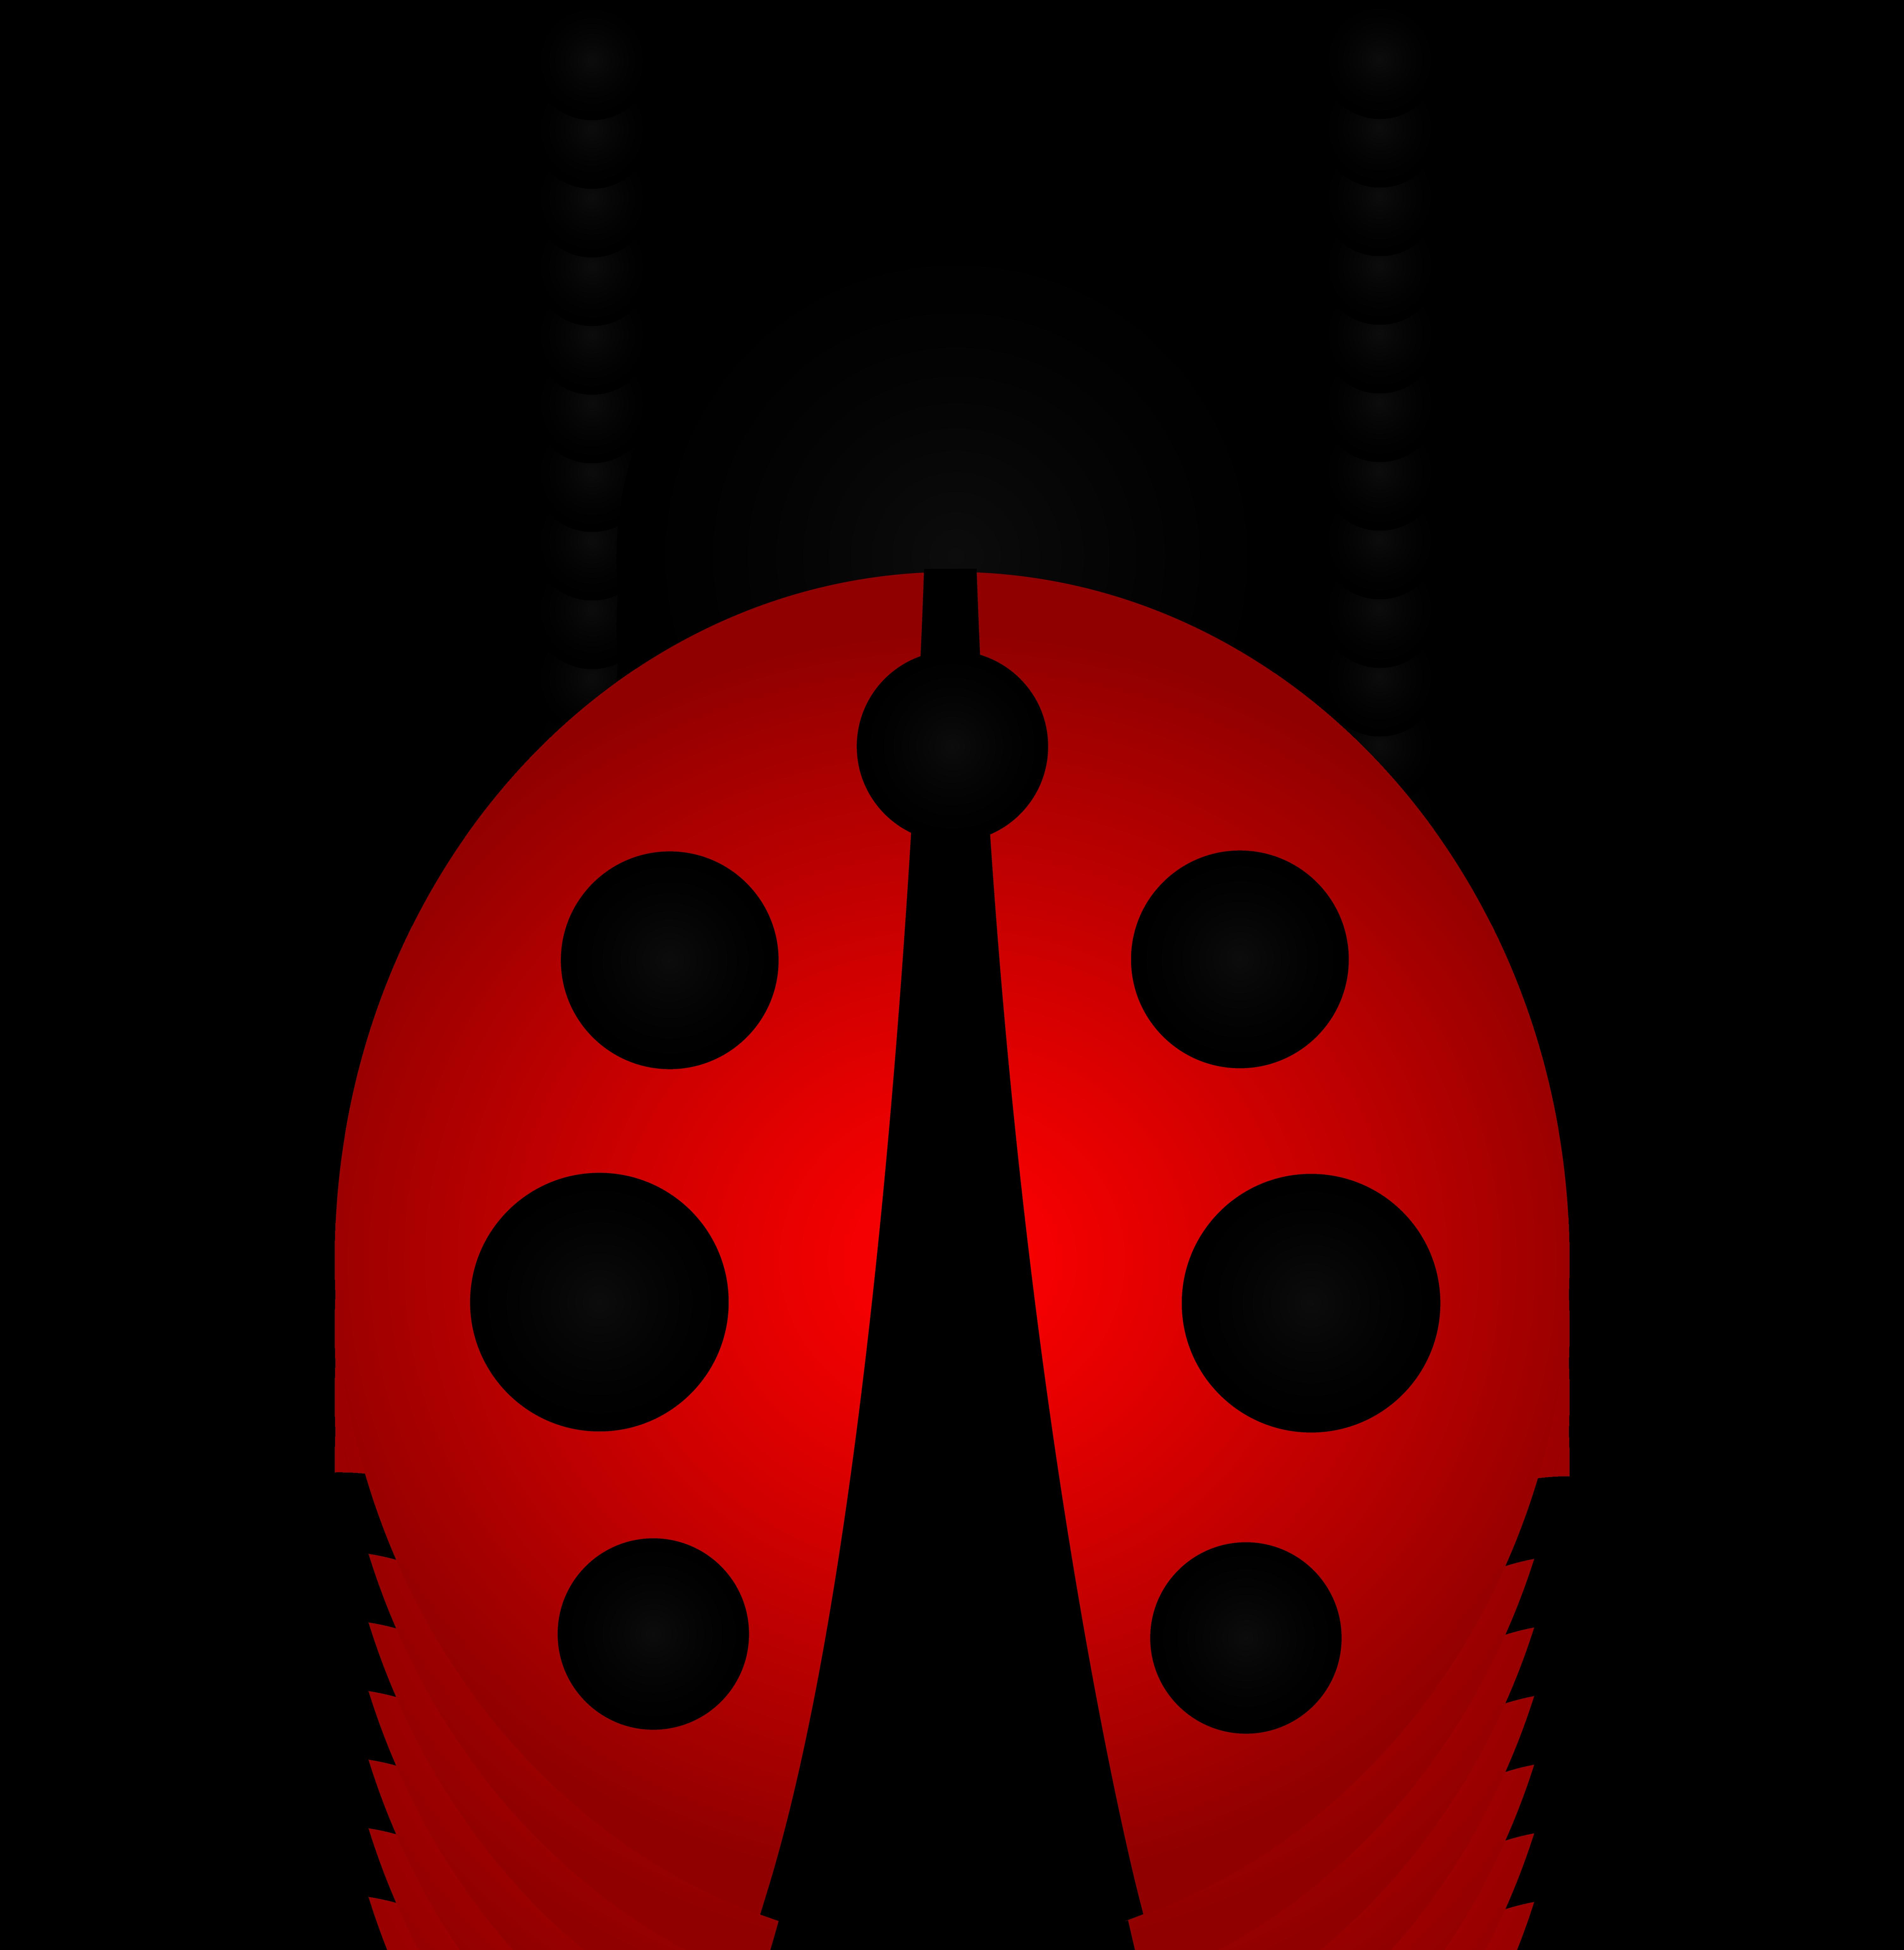 Little red clip art. Ladybug clipart let's celebrate